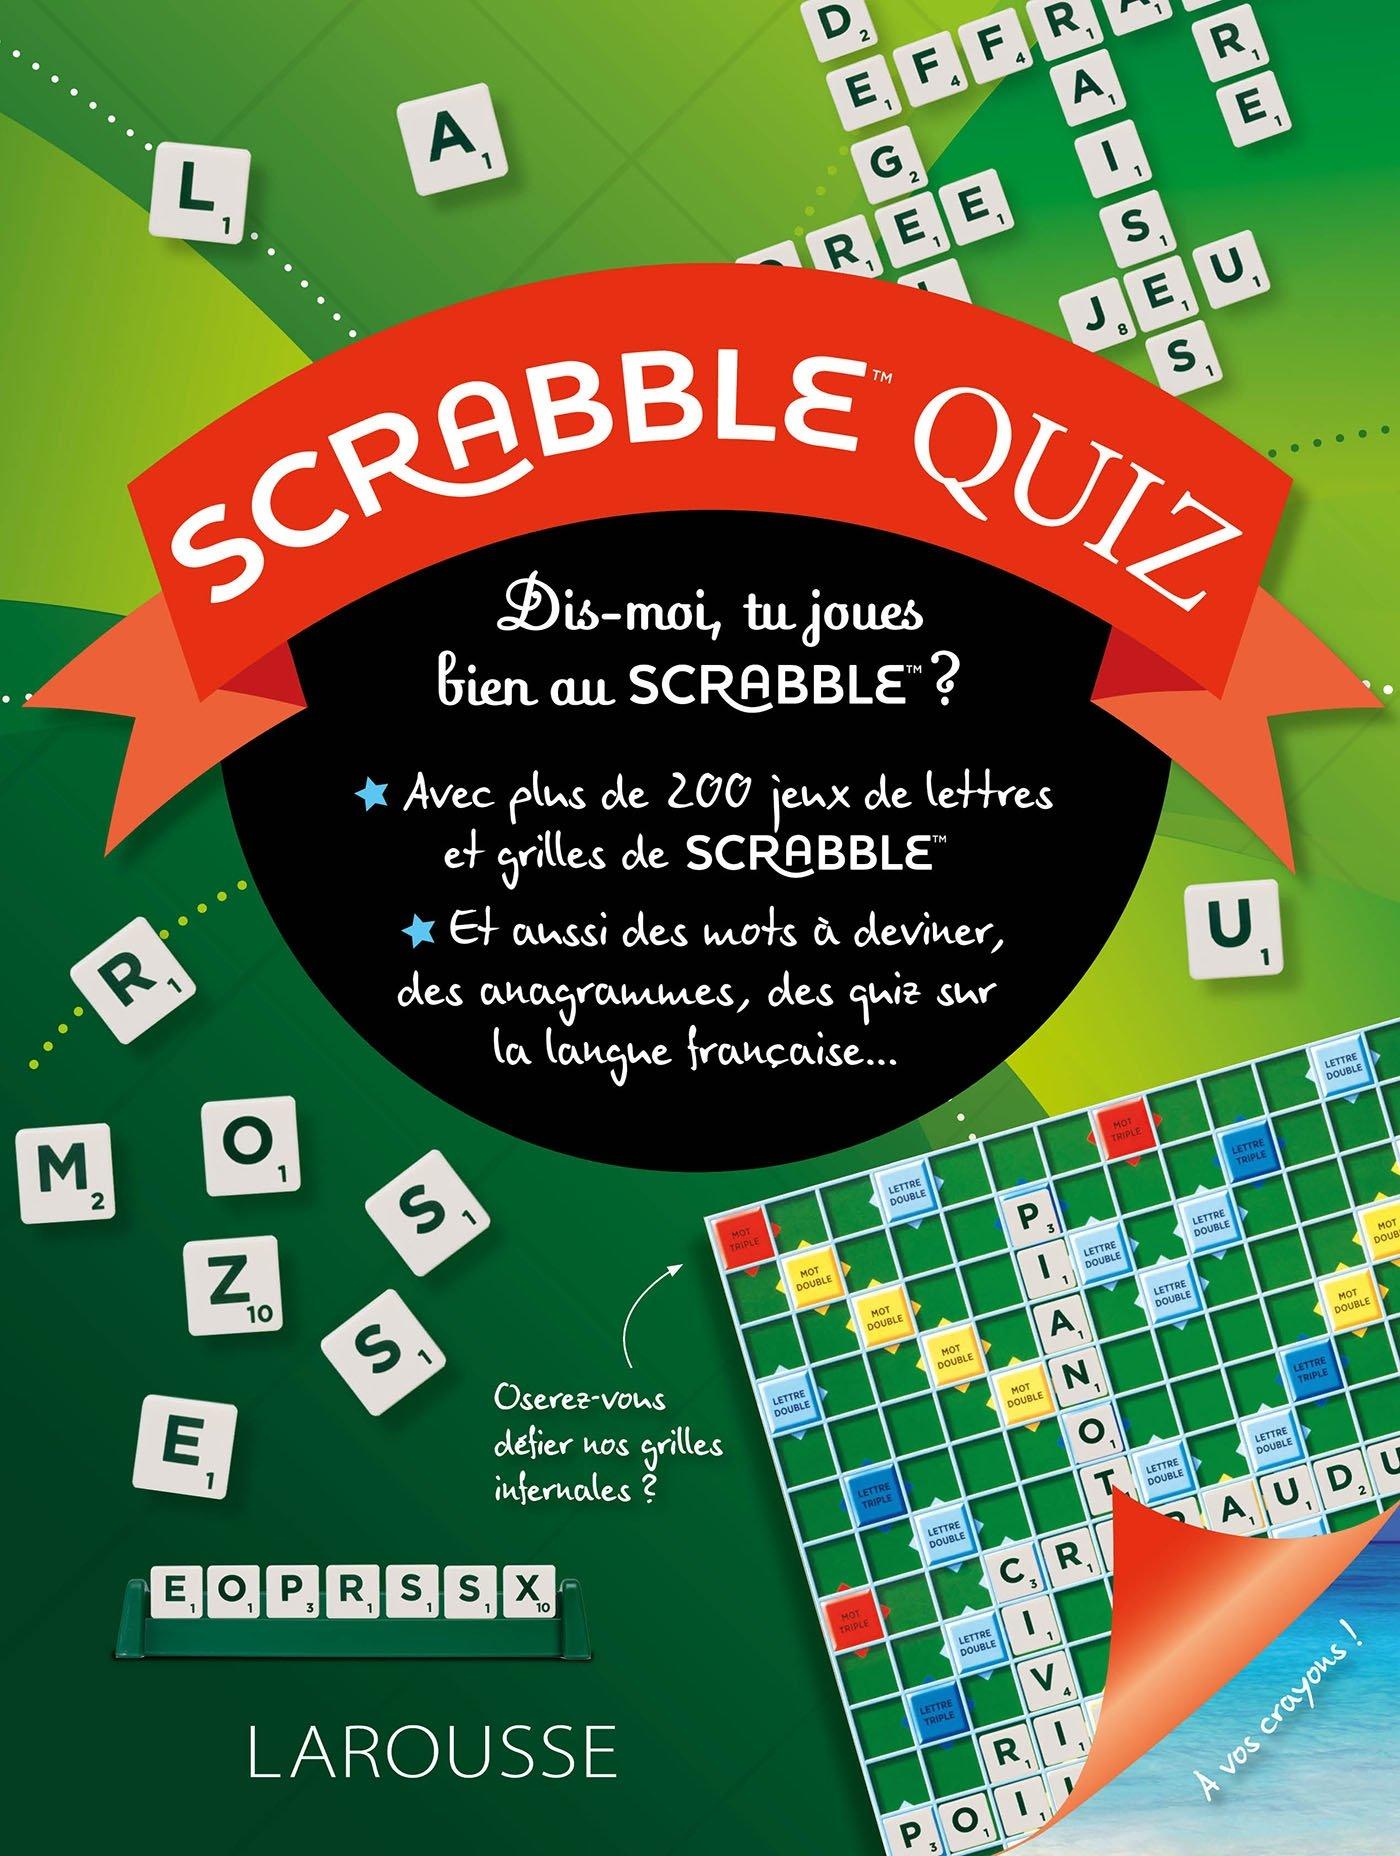 Scrabble Quiz (Jeux et activités): Amazon.es: Collectif: Libros en idiomas extranjeros